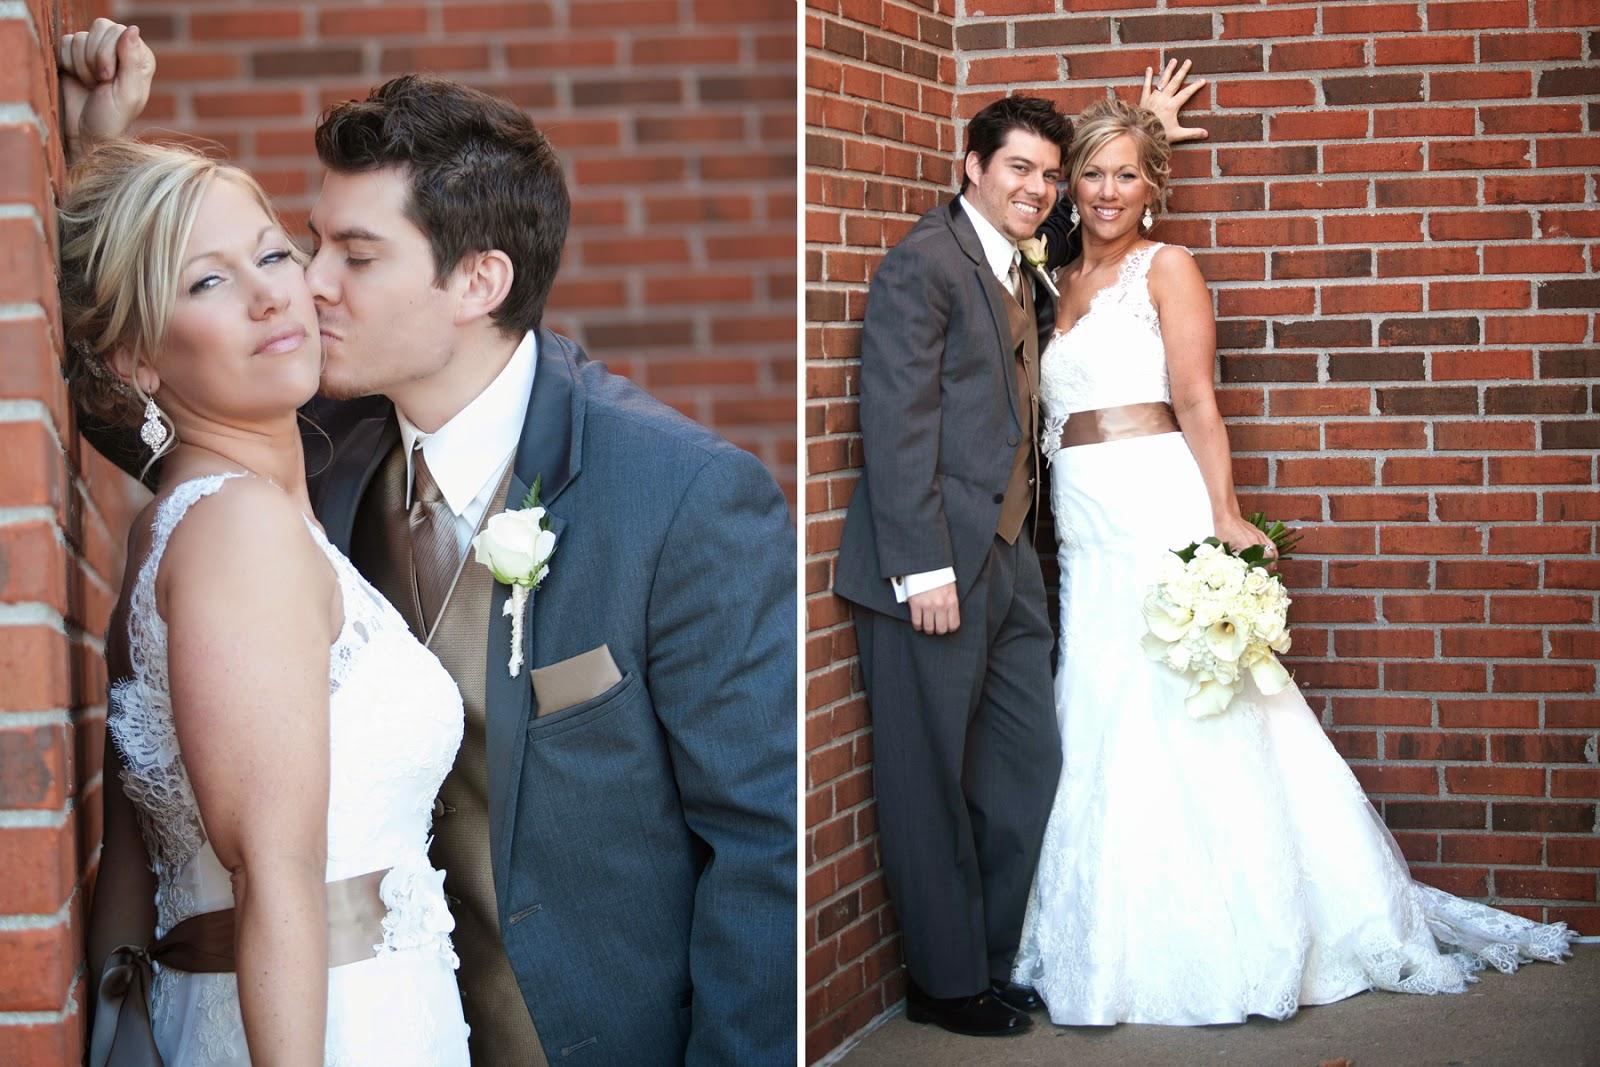 James Woods Decatur >> MY NORTHWOODS LIFE: Fornear Photo Friday | Eric & Elizabeth's Decatur, IL Wedding